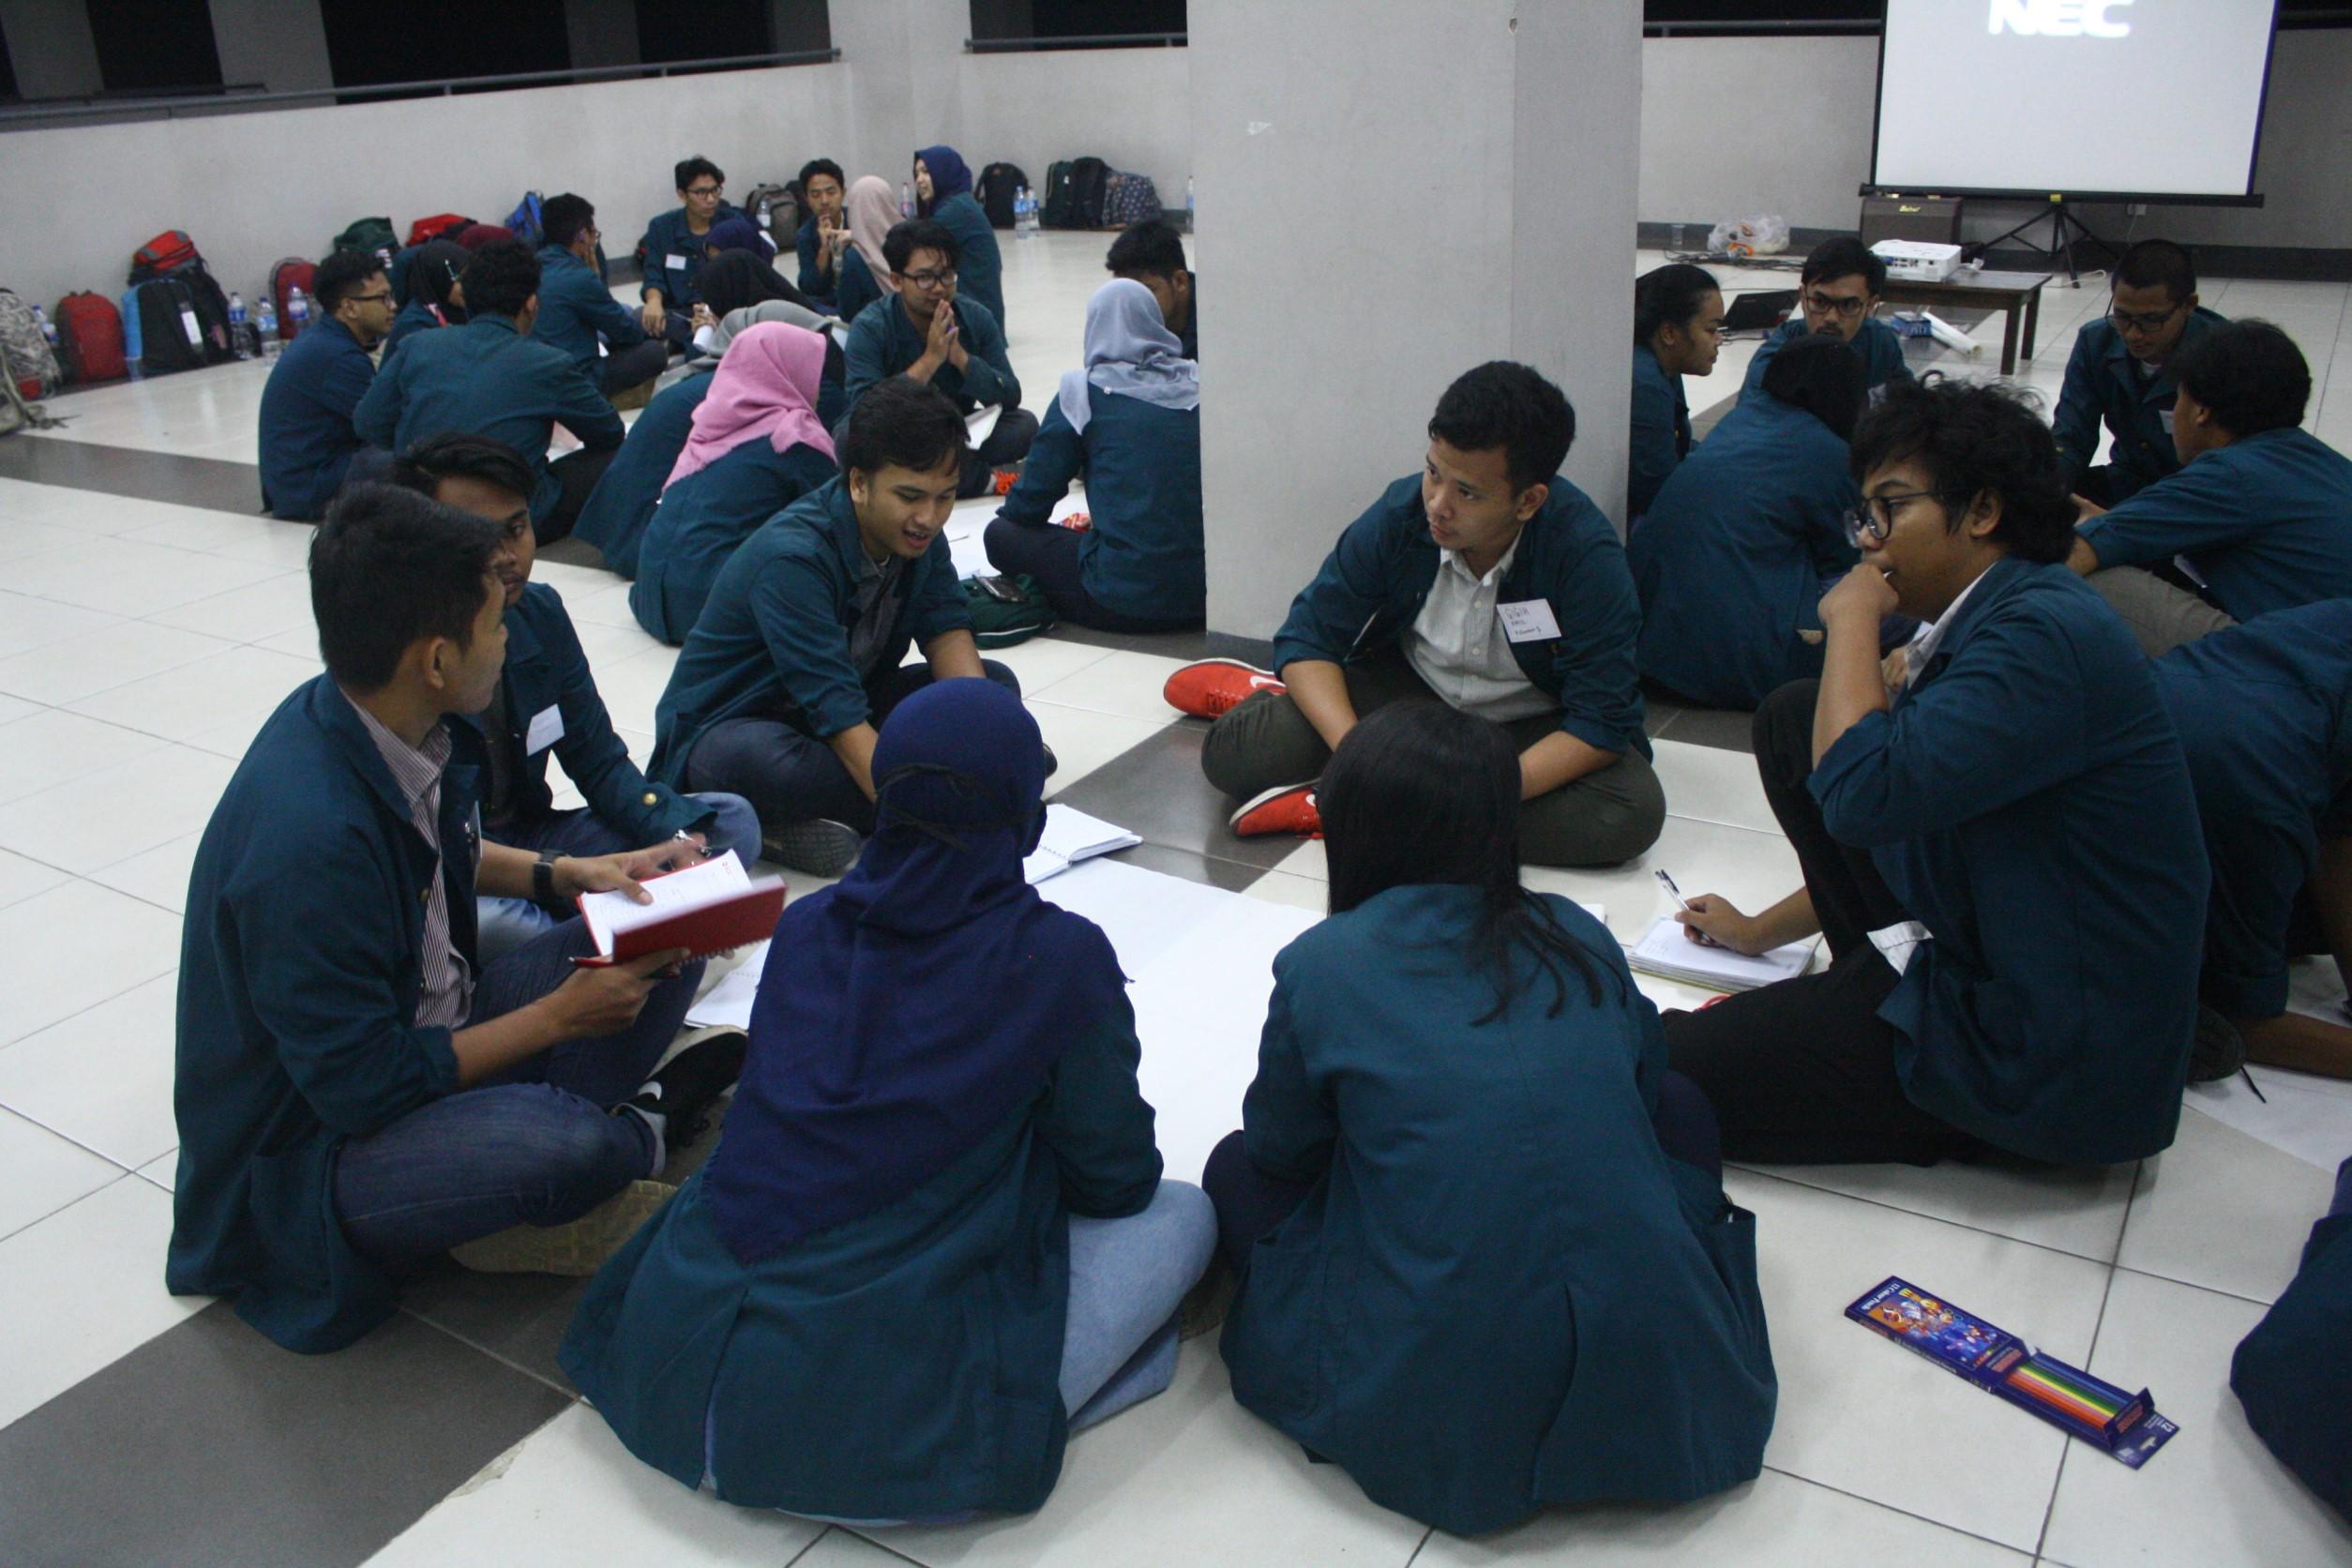 Diskusi Peserta Pada Acara Diklat Dasar Aktivis Terpusat 2018